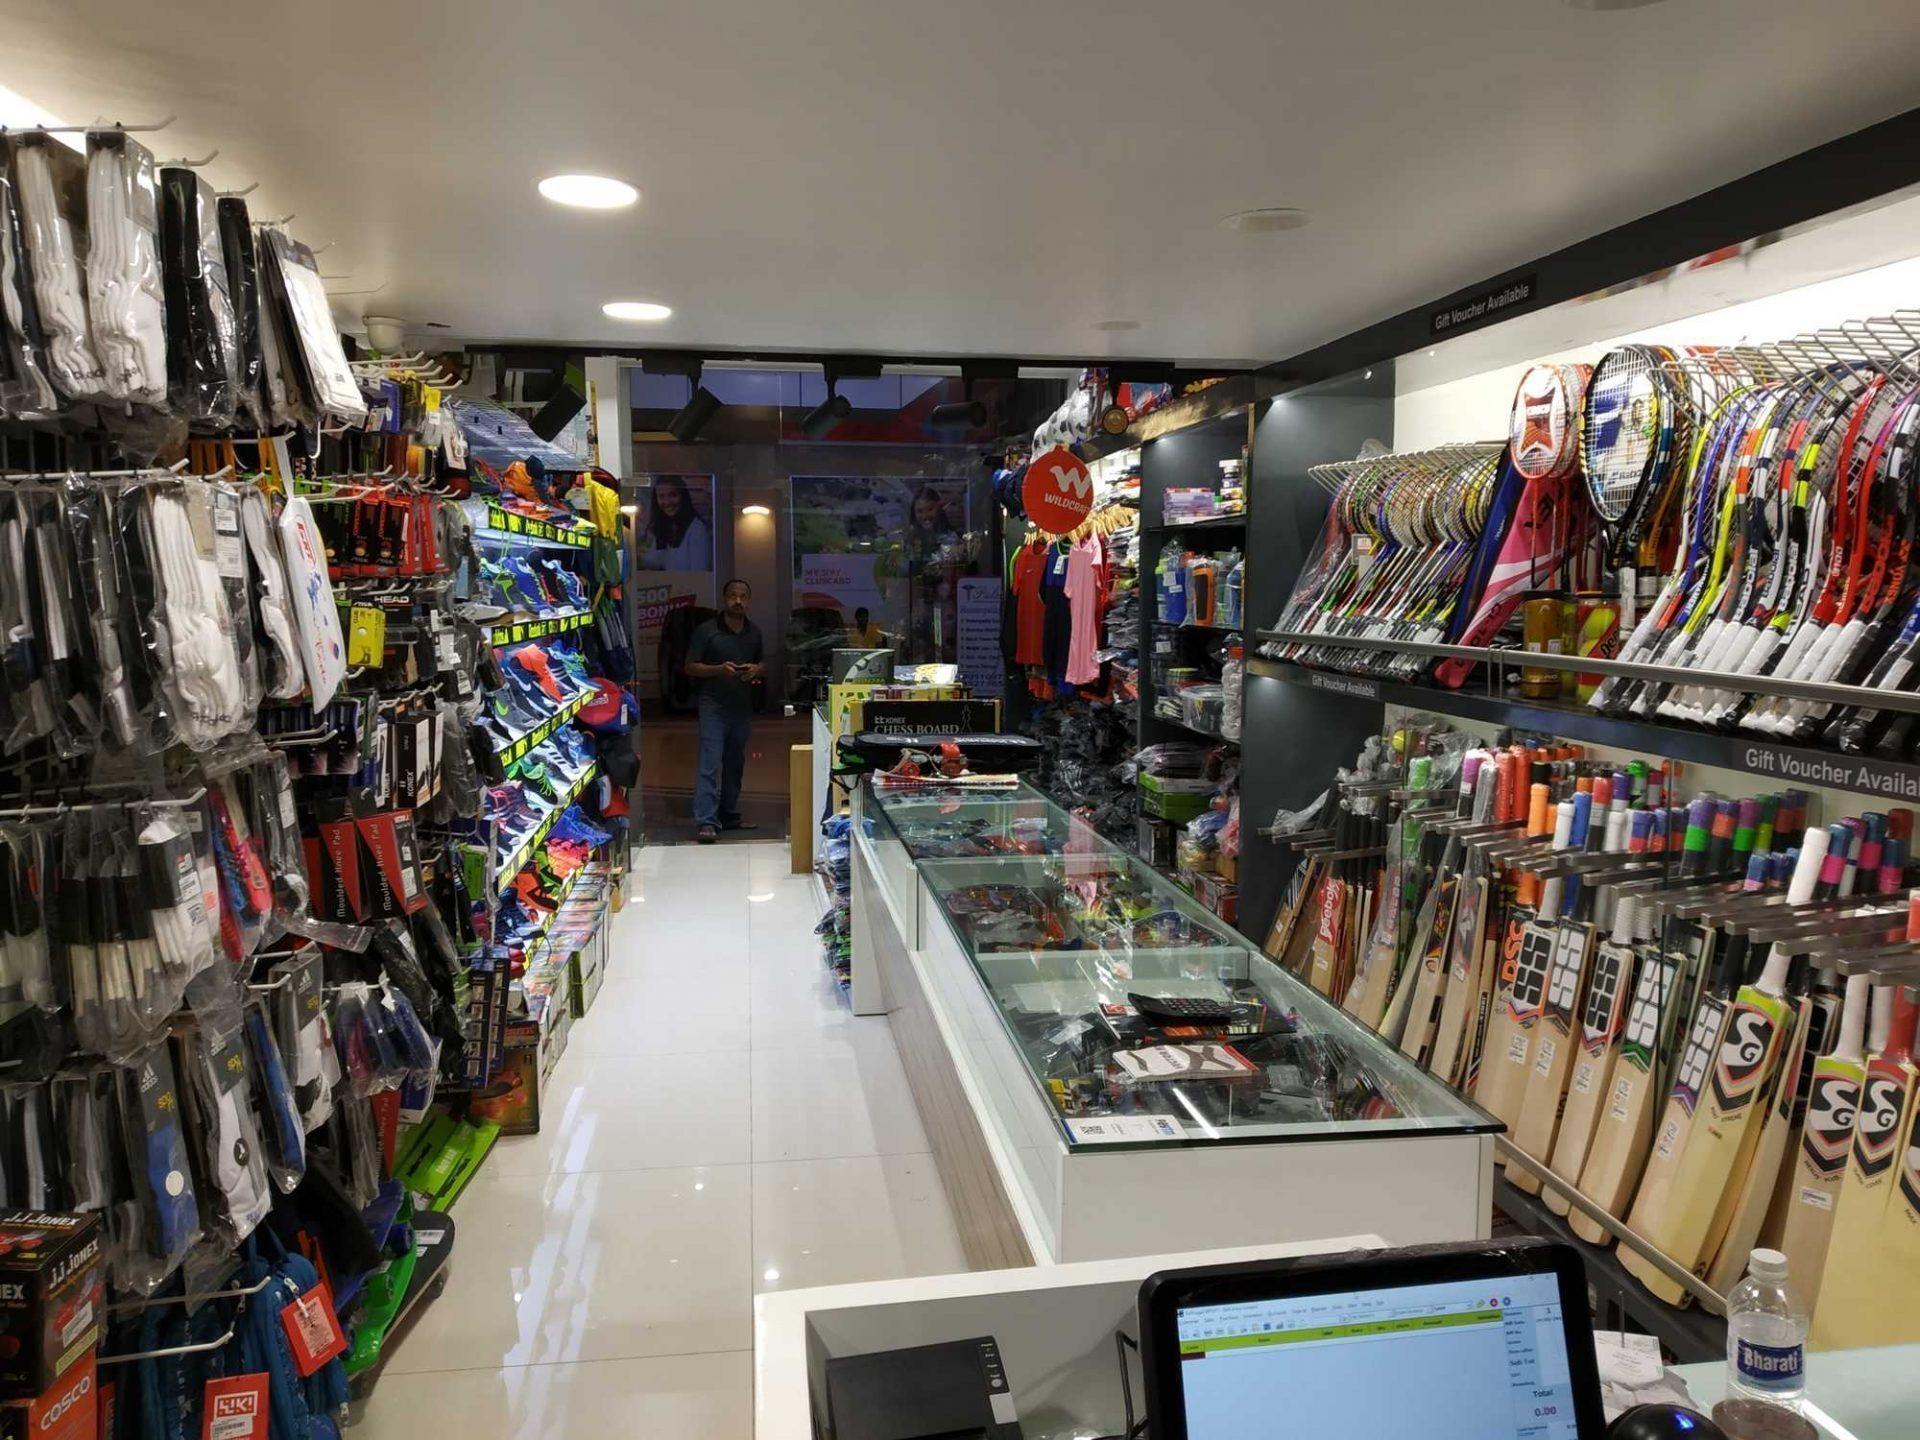 SK-Sports-Goods-Store-shop-interior1 Sports Goods Store / Shop in Pimple Saudagar – SK Sports and Sales | sports goods store / shop in pimple saudagar